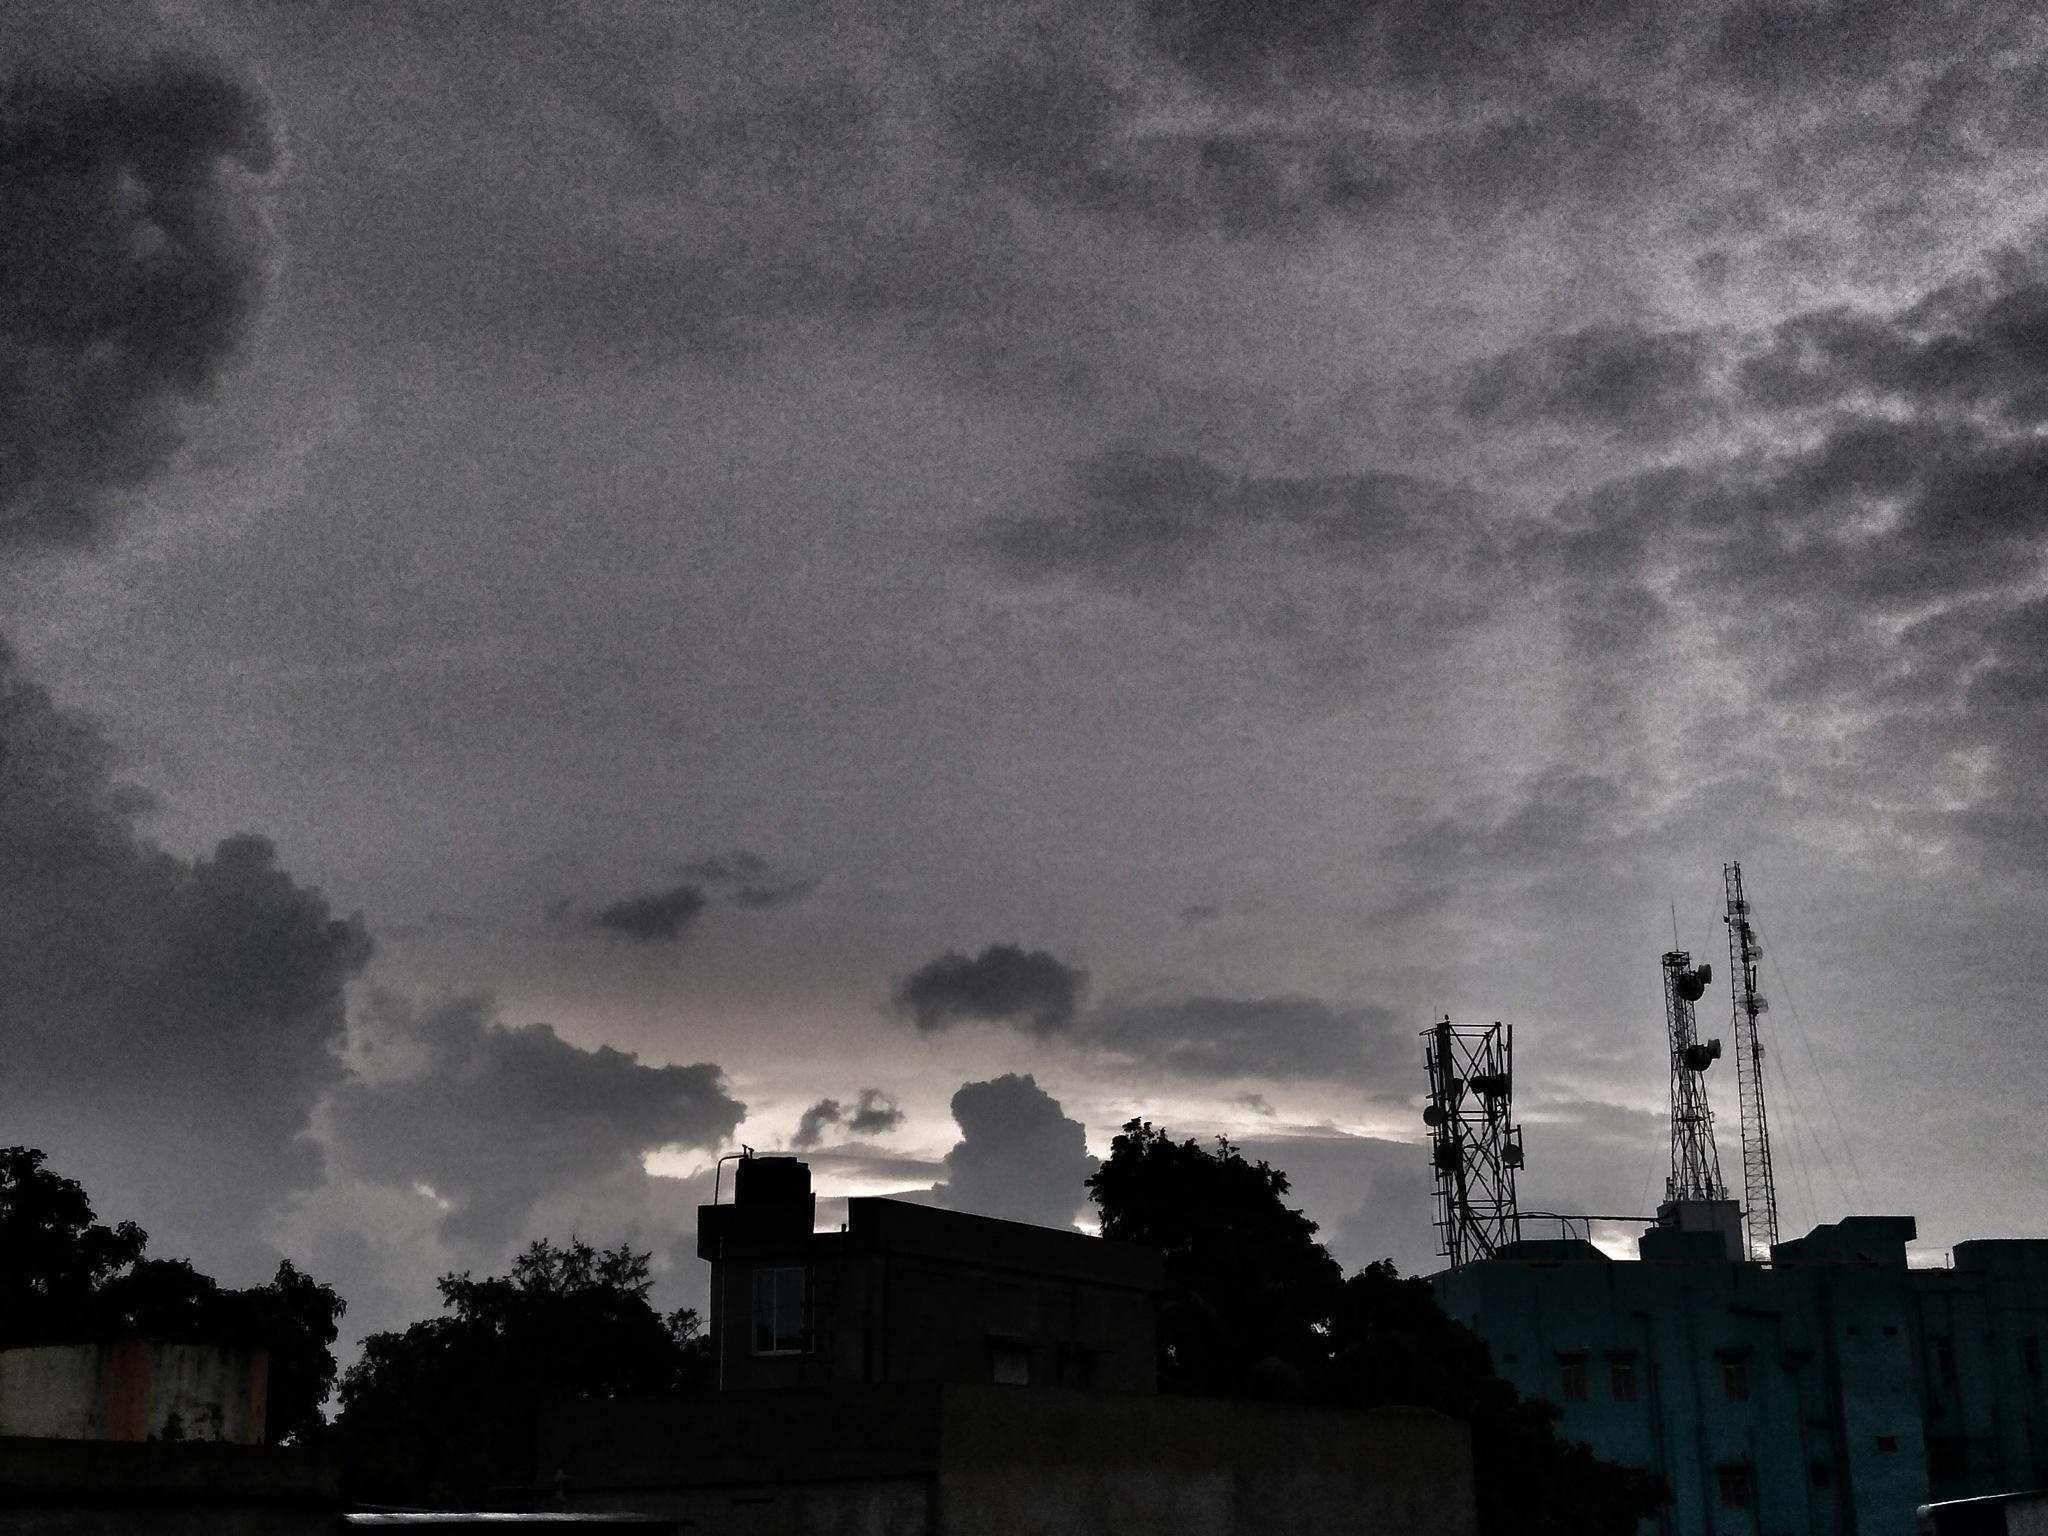 monsoon morning by soumitramaity39